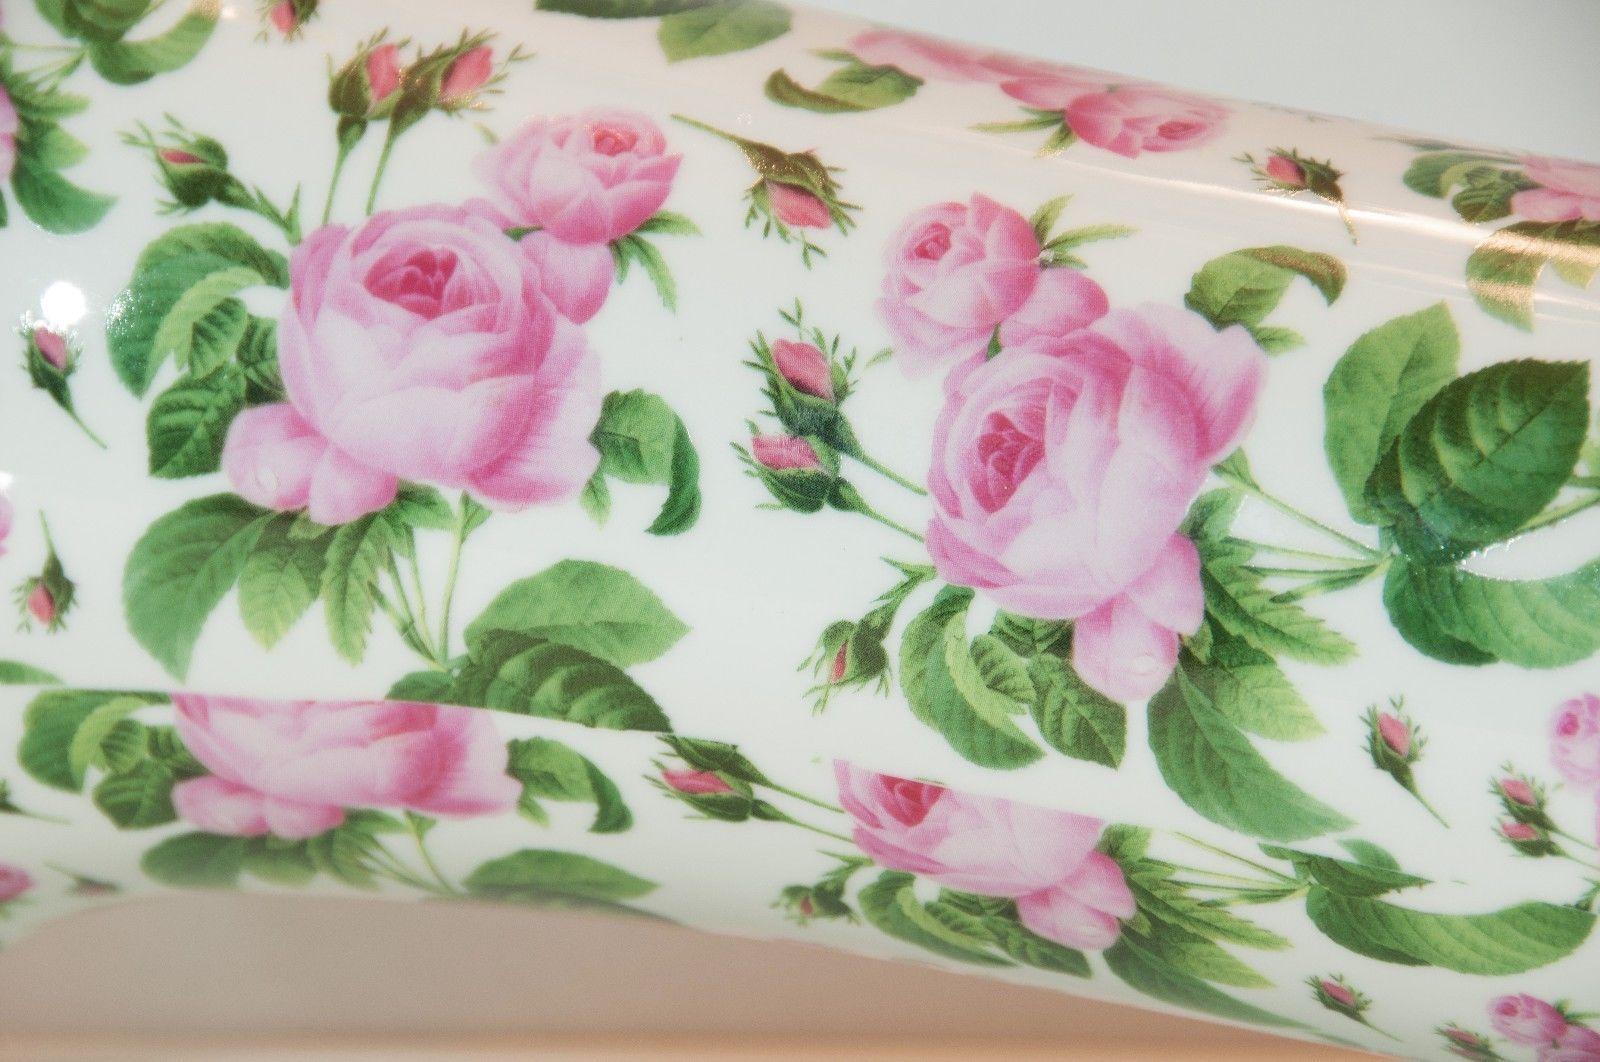 Vase baum brothers formalities pink rose and 50 similar items 57 thumb200 reviewsmspy